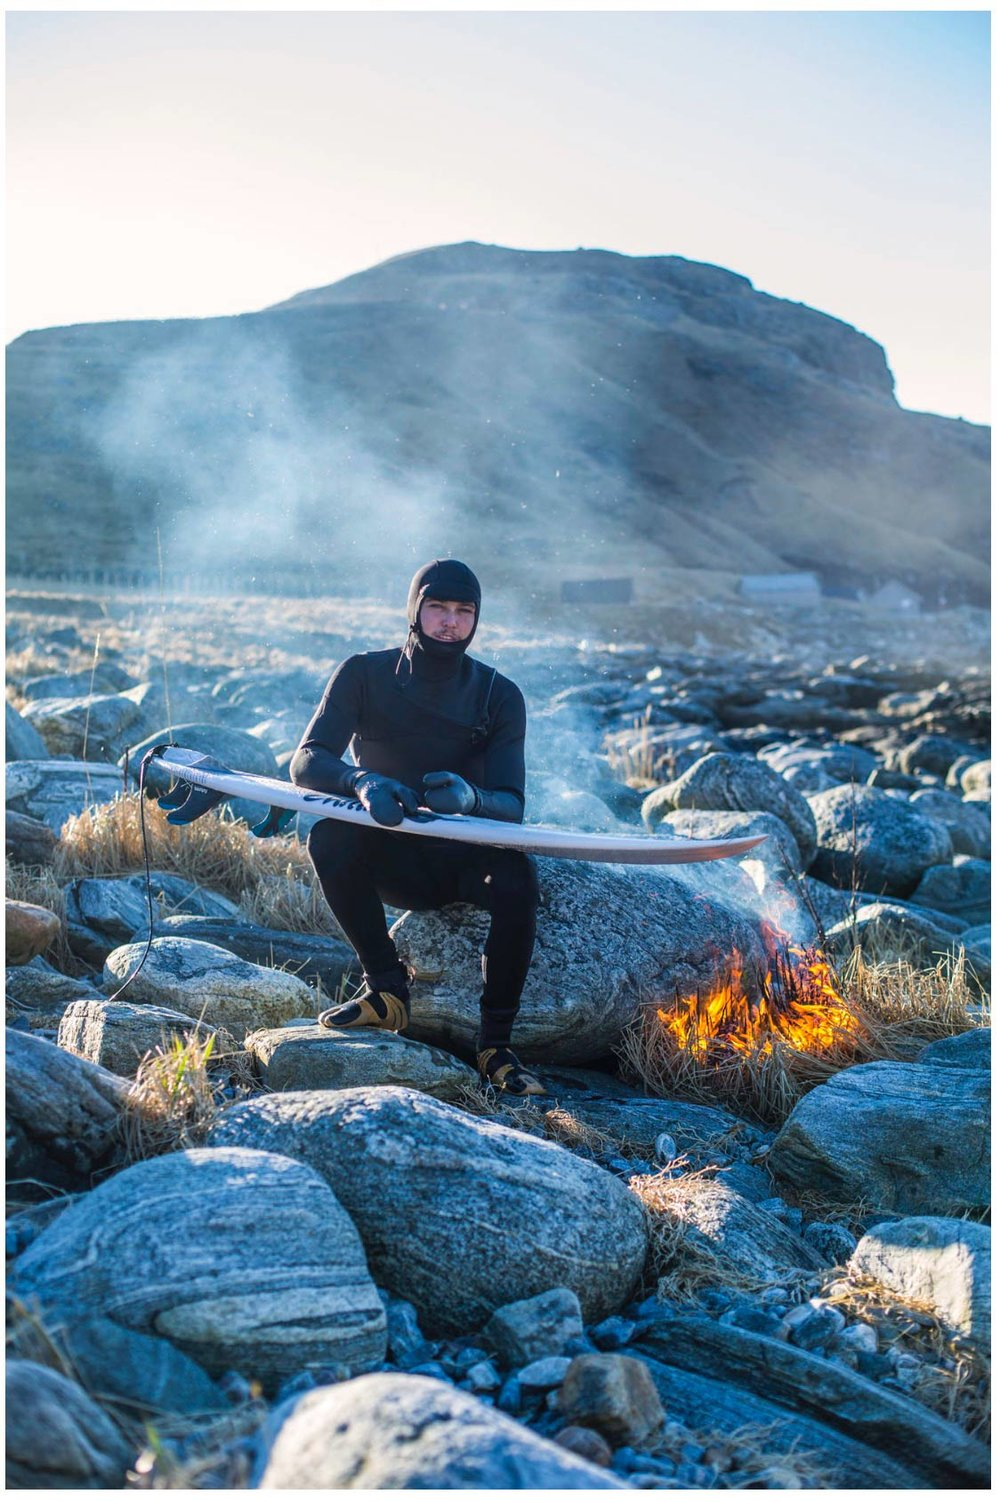 rodd-owen-ocean-surf-photography-for-sale-drone-063.jpg